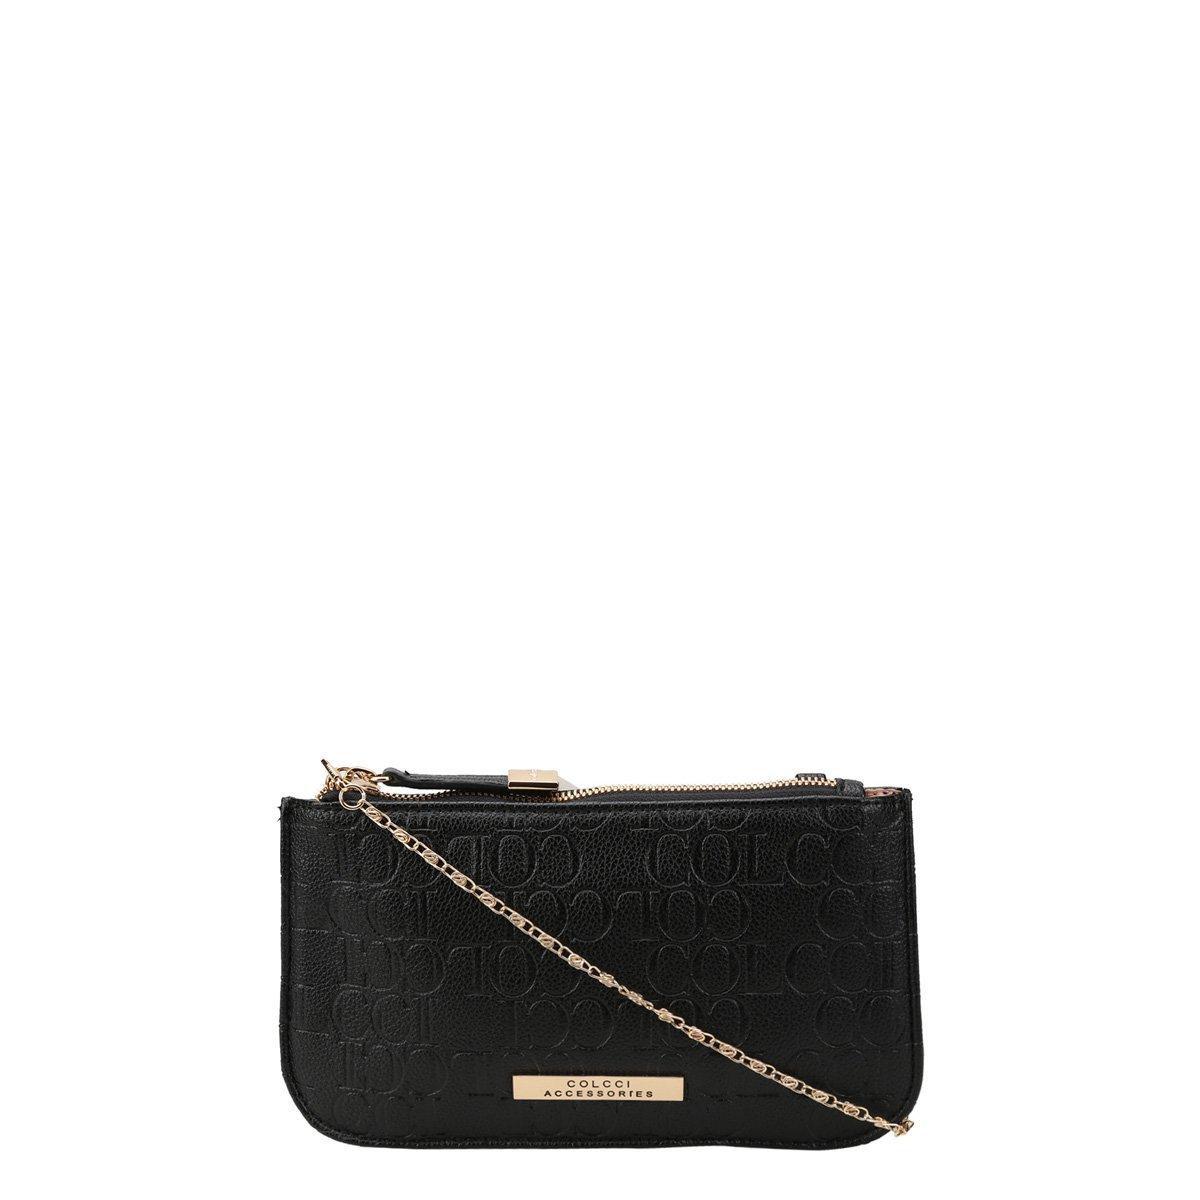 e872a4353 Bolsa Colcci Mini Bag Tiracolo Alça Corrente Placa Feminina